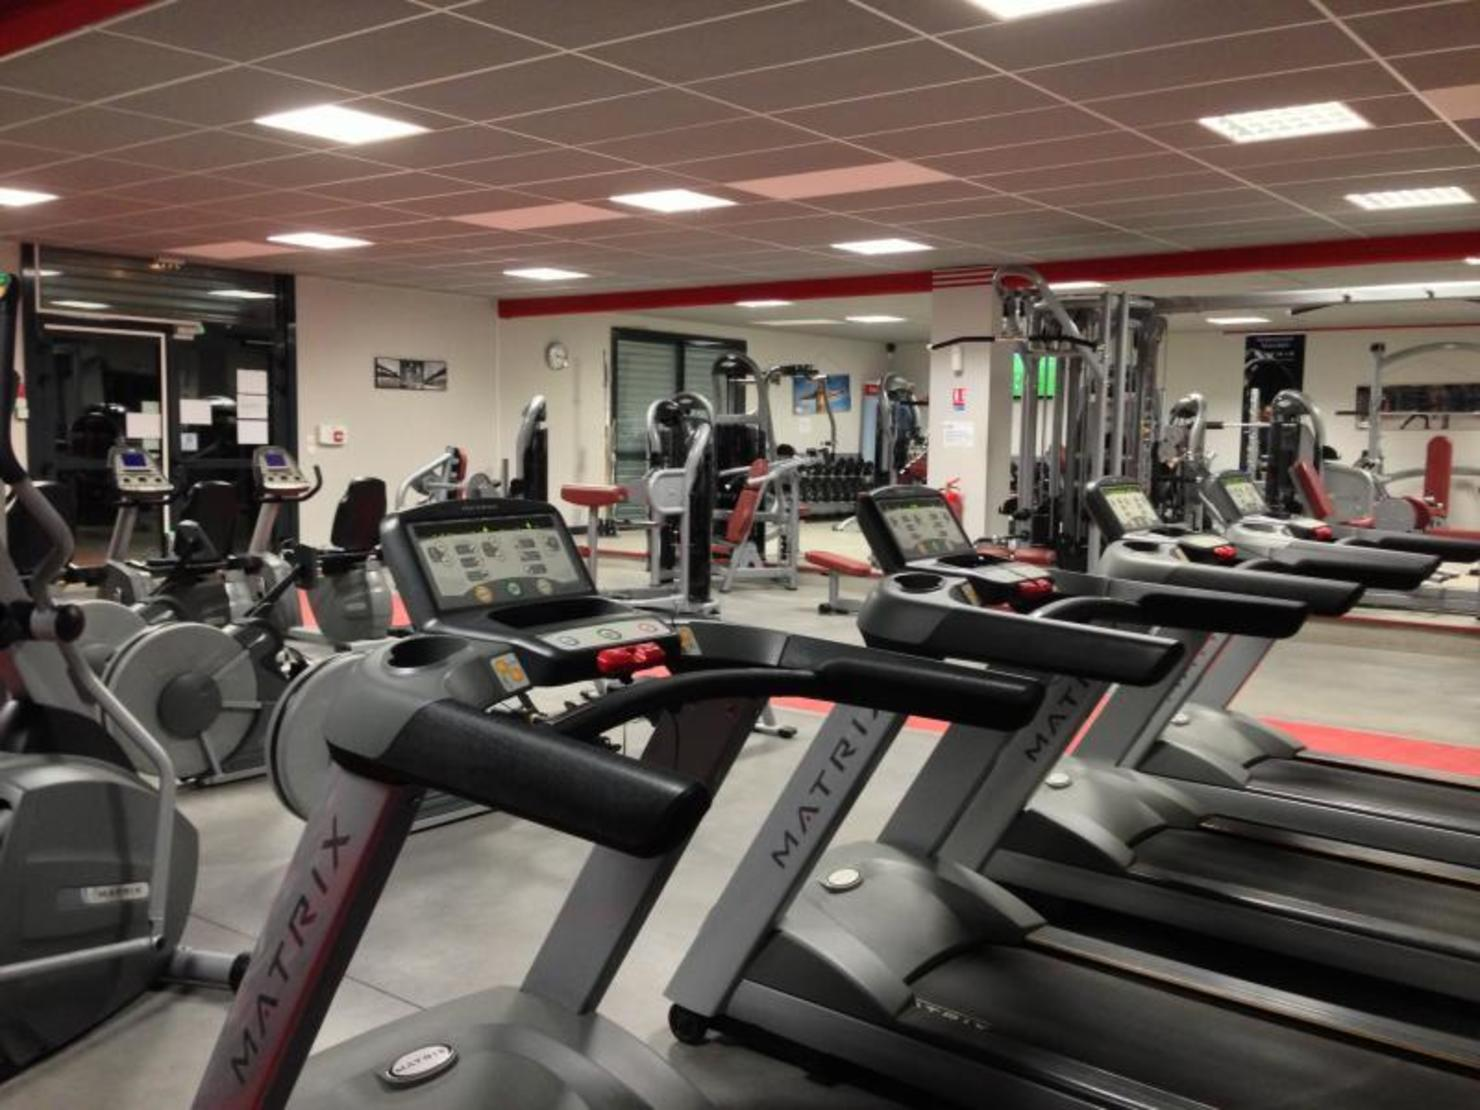 area gym gignac tarifs avis horaires essai gratuit